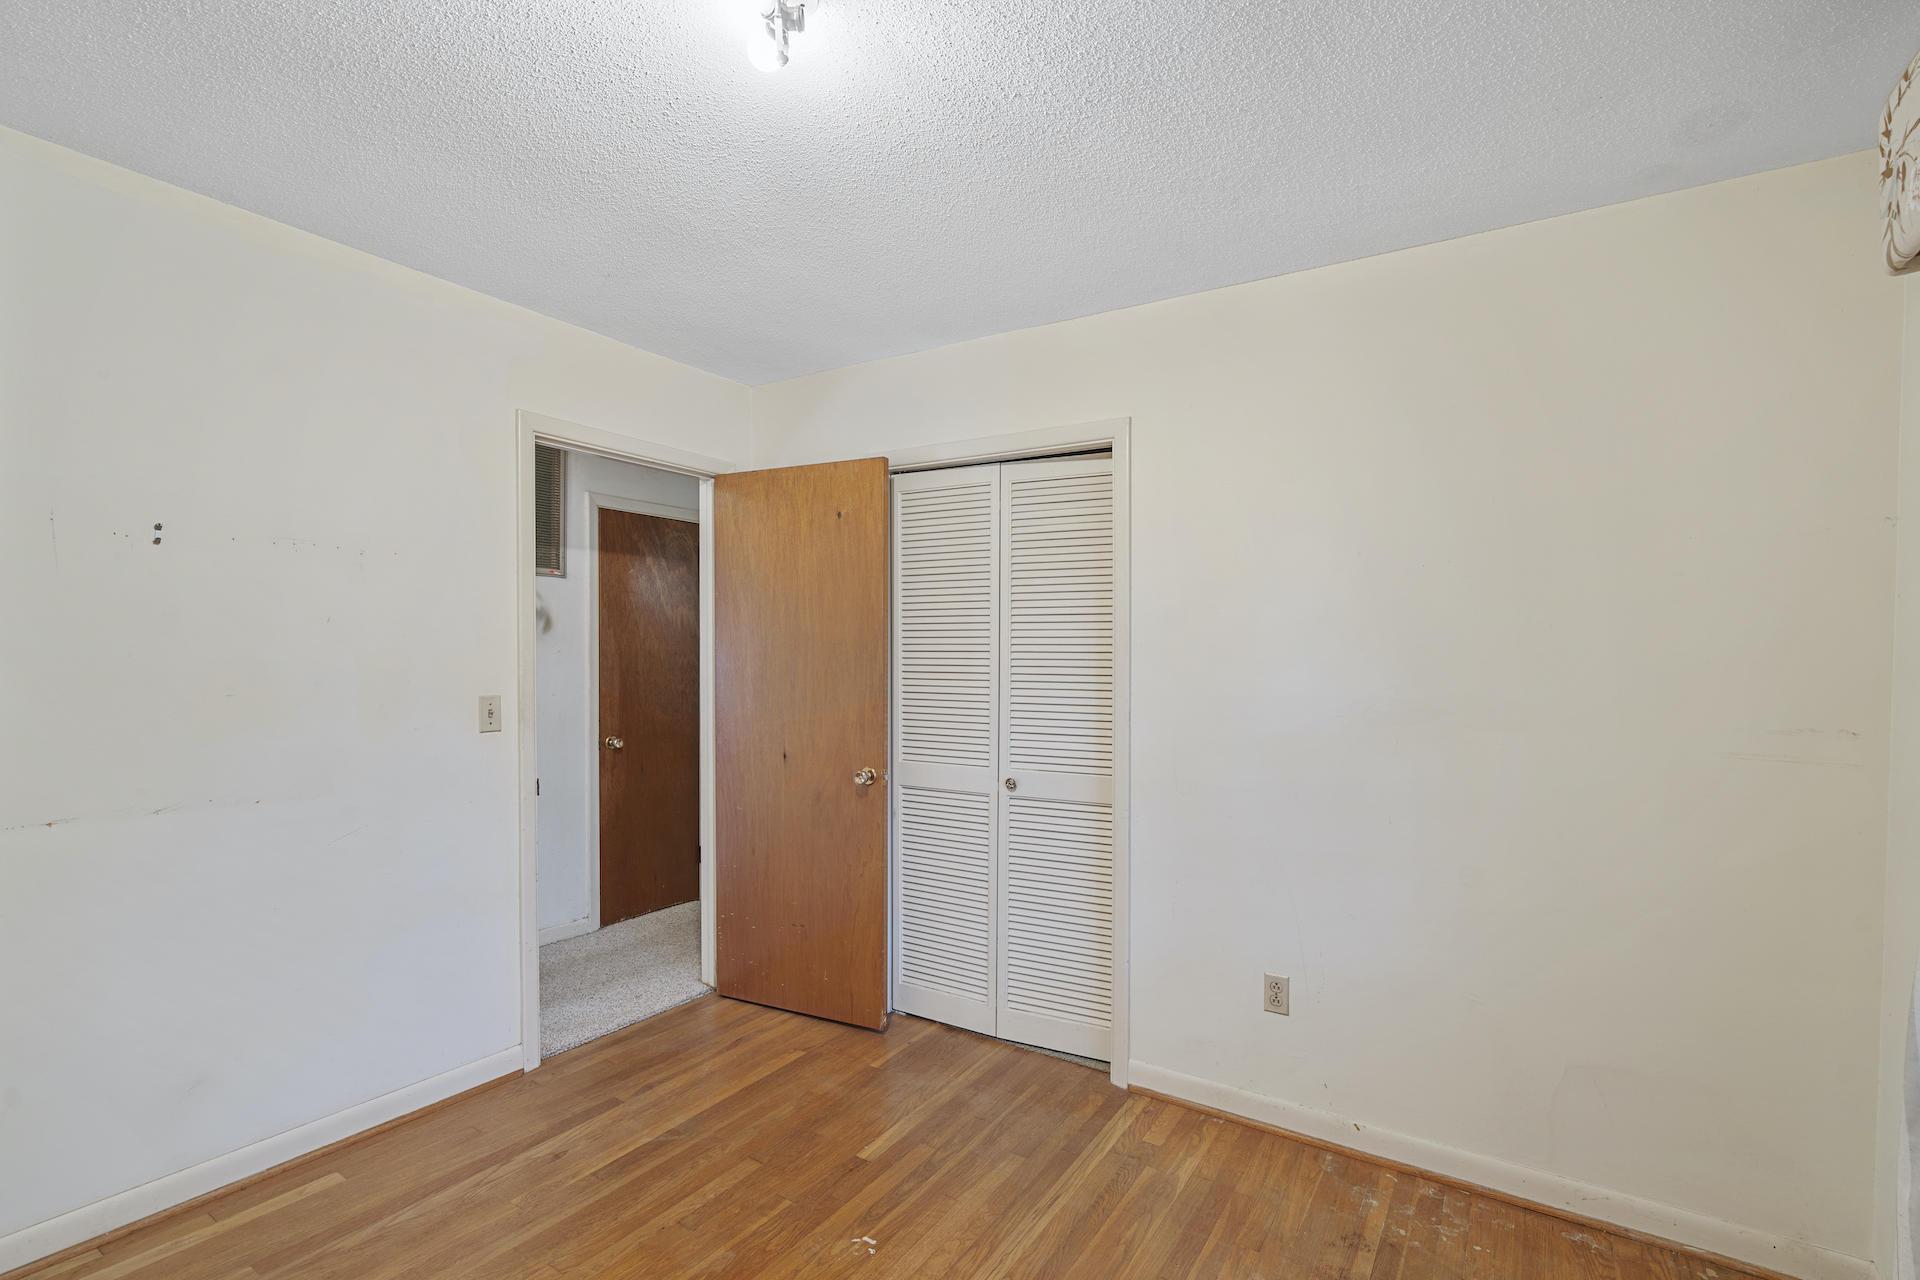 Charlestowne Estates I Homes For Sale - 1137 Culpepper, Charleston, SC - 15